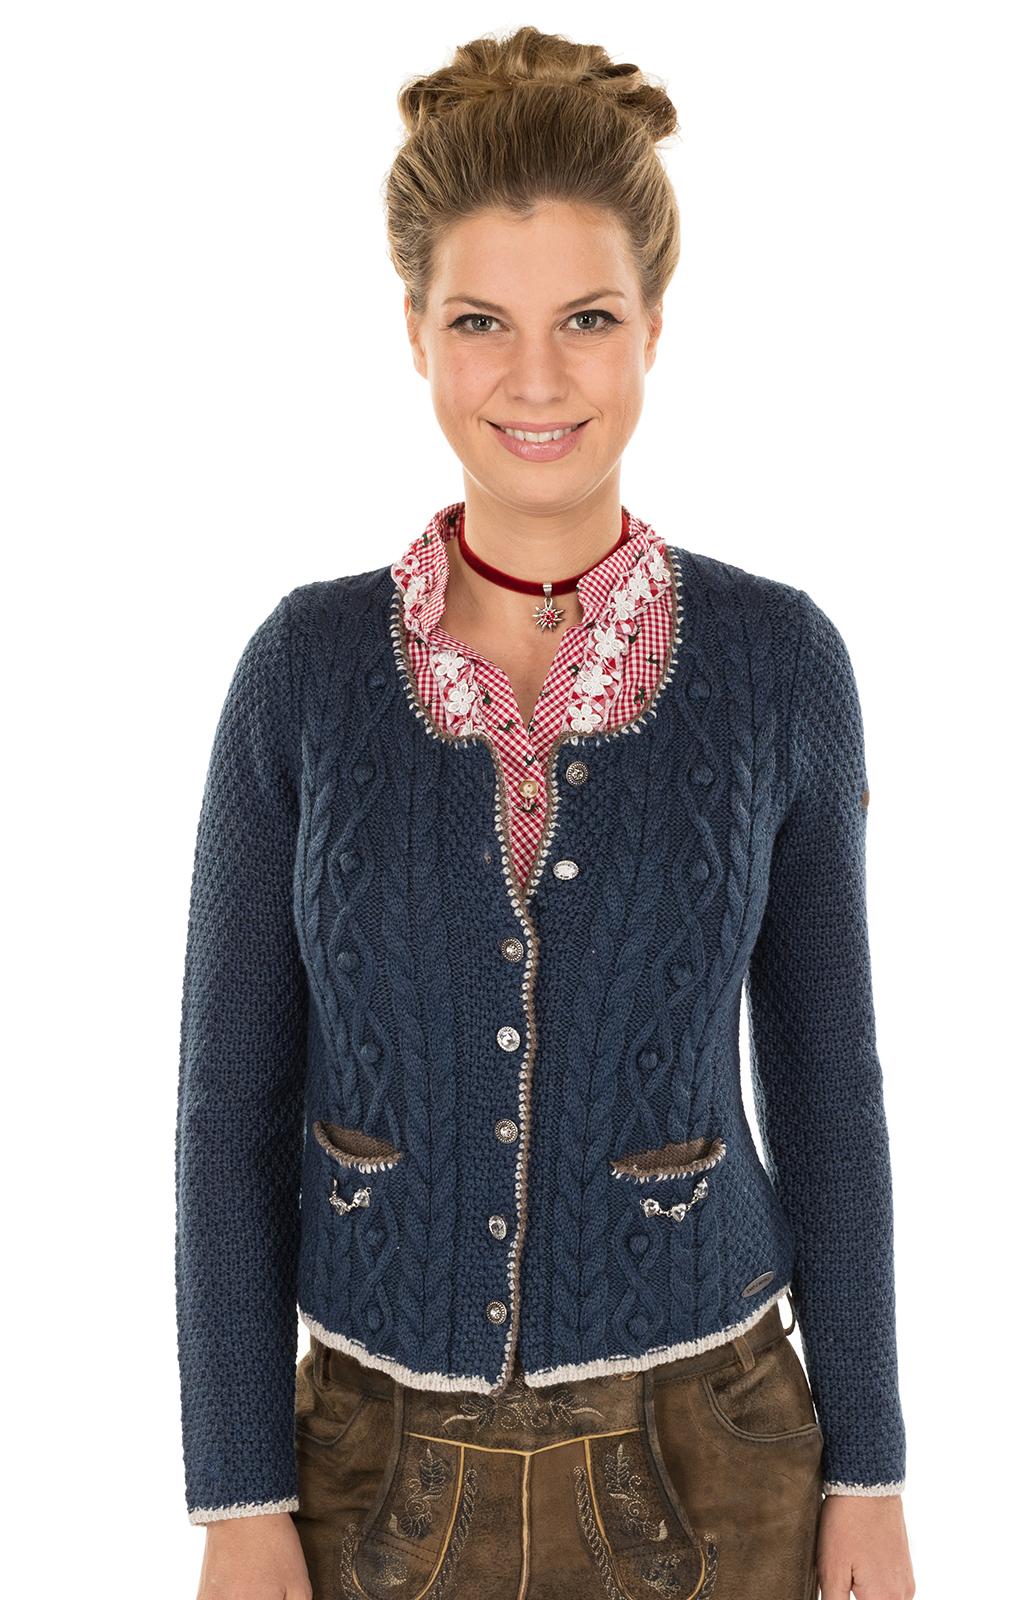 Giacca in maglia Aidas jeansblau von Spieth & Wensky